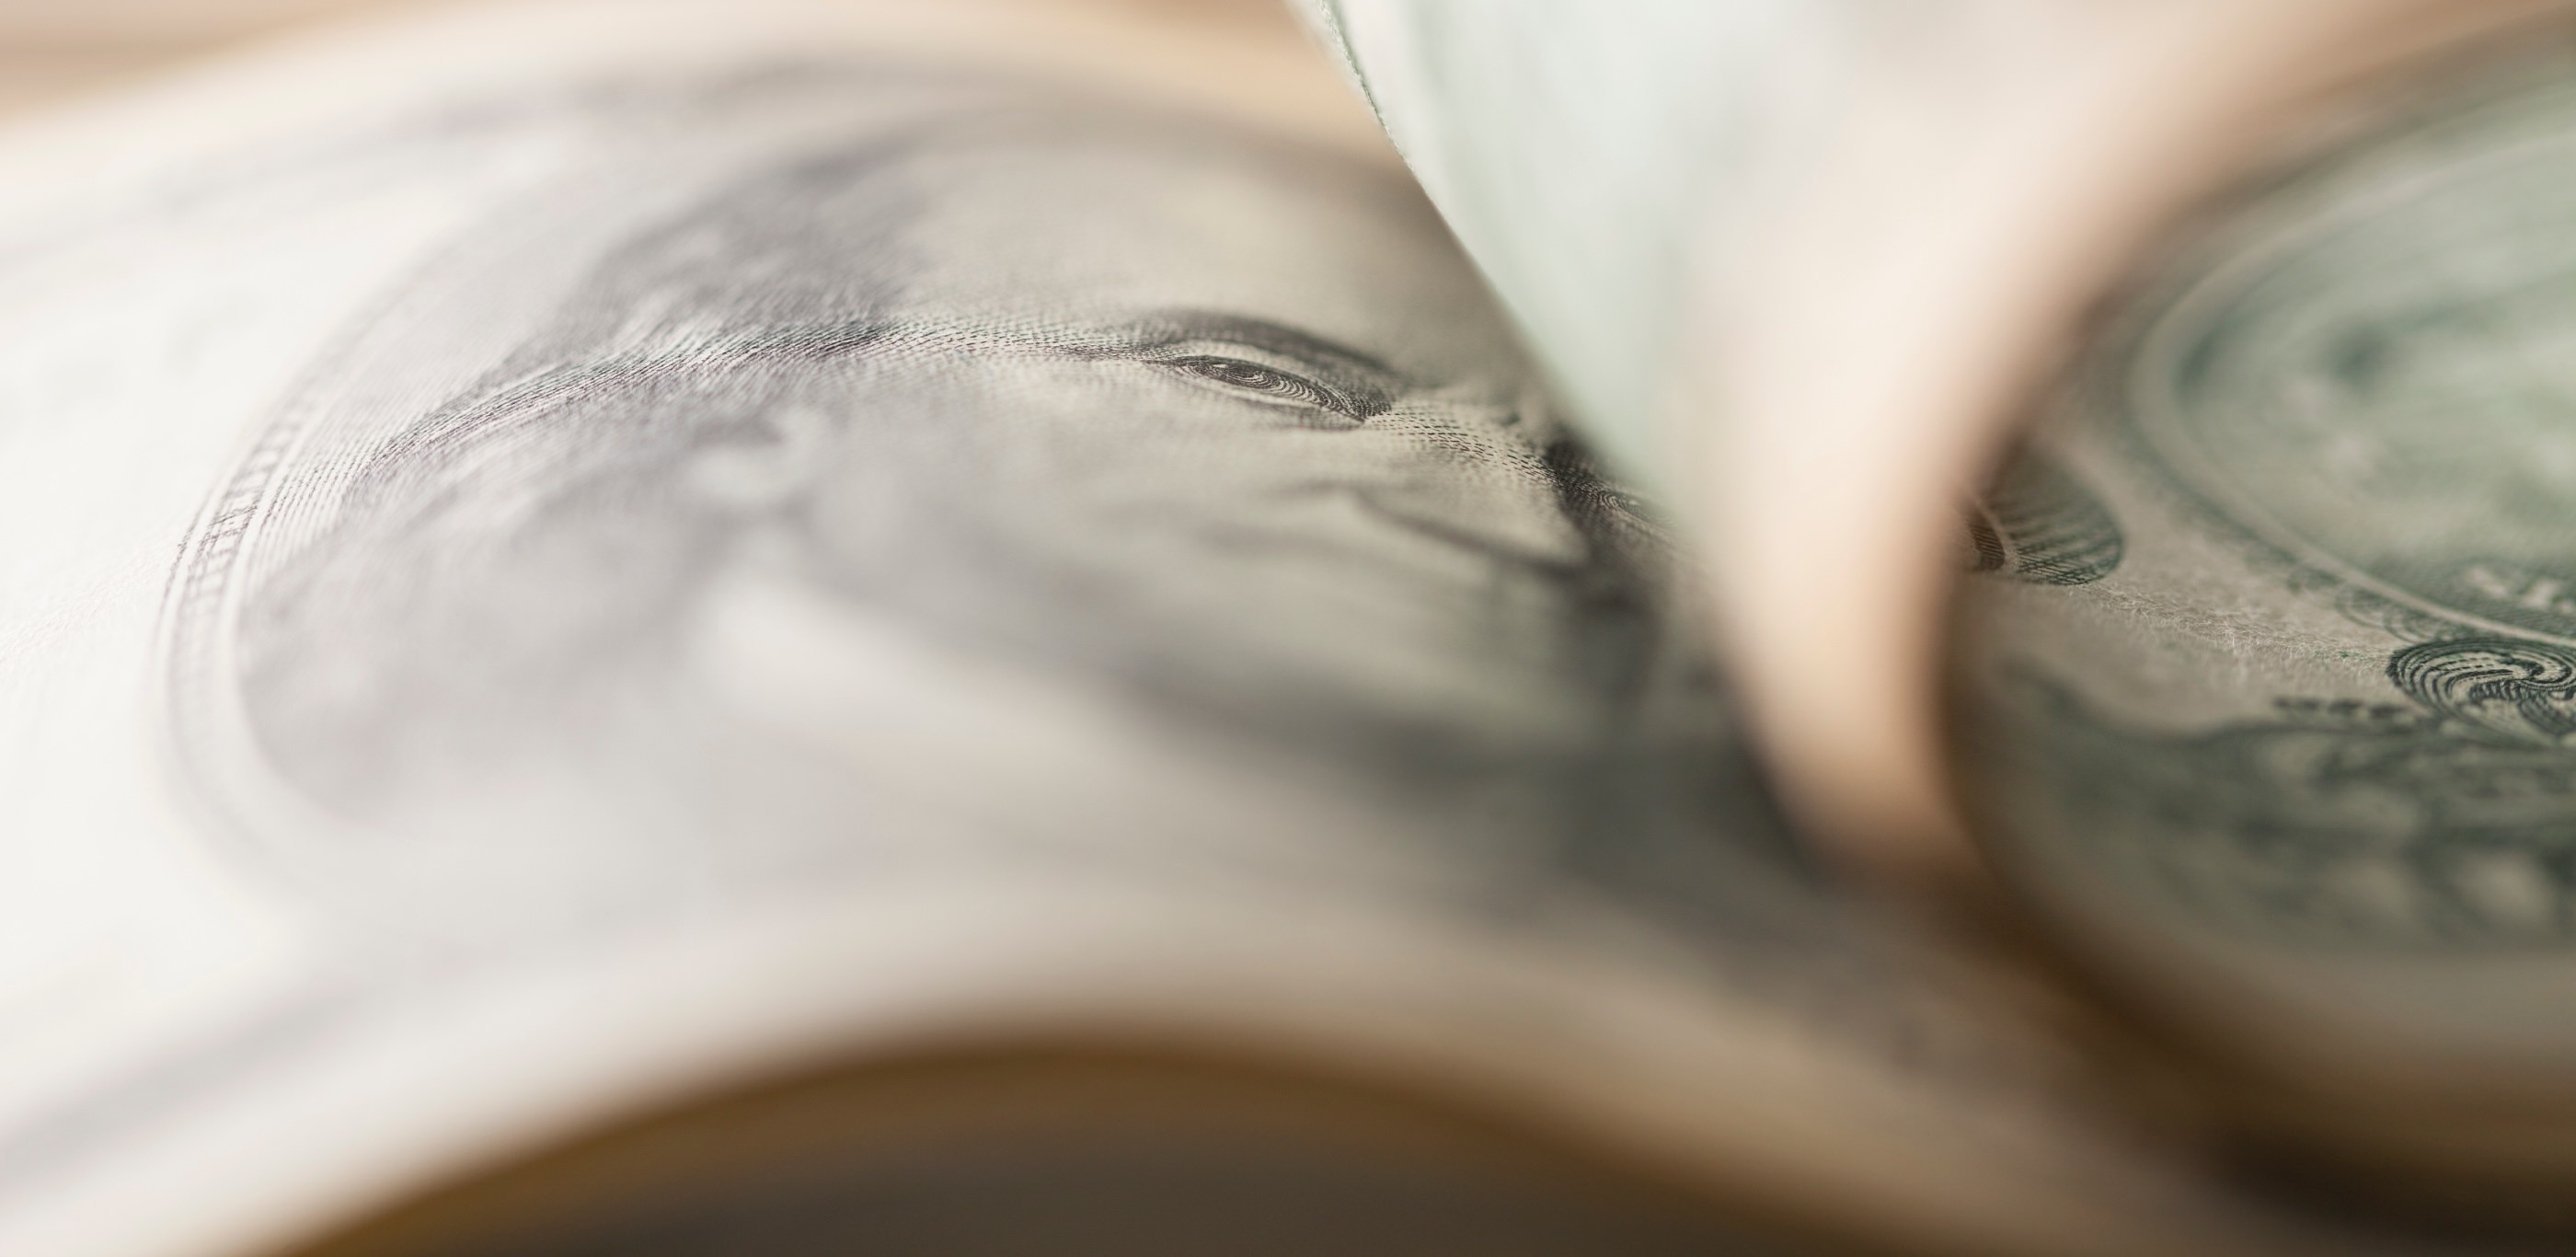 C3 Anti-money Laundering application